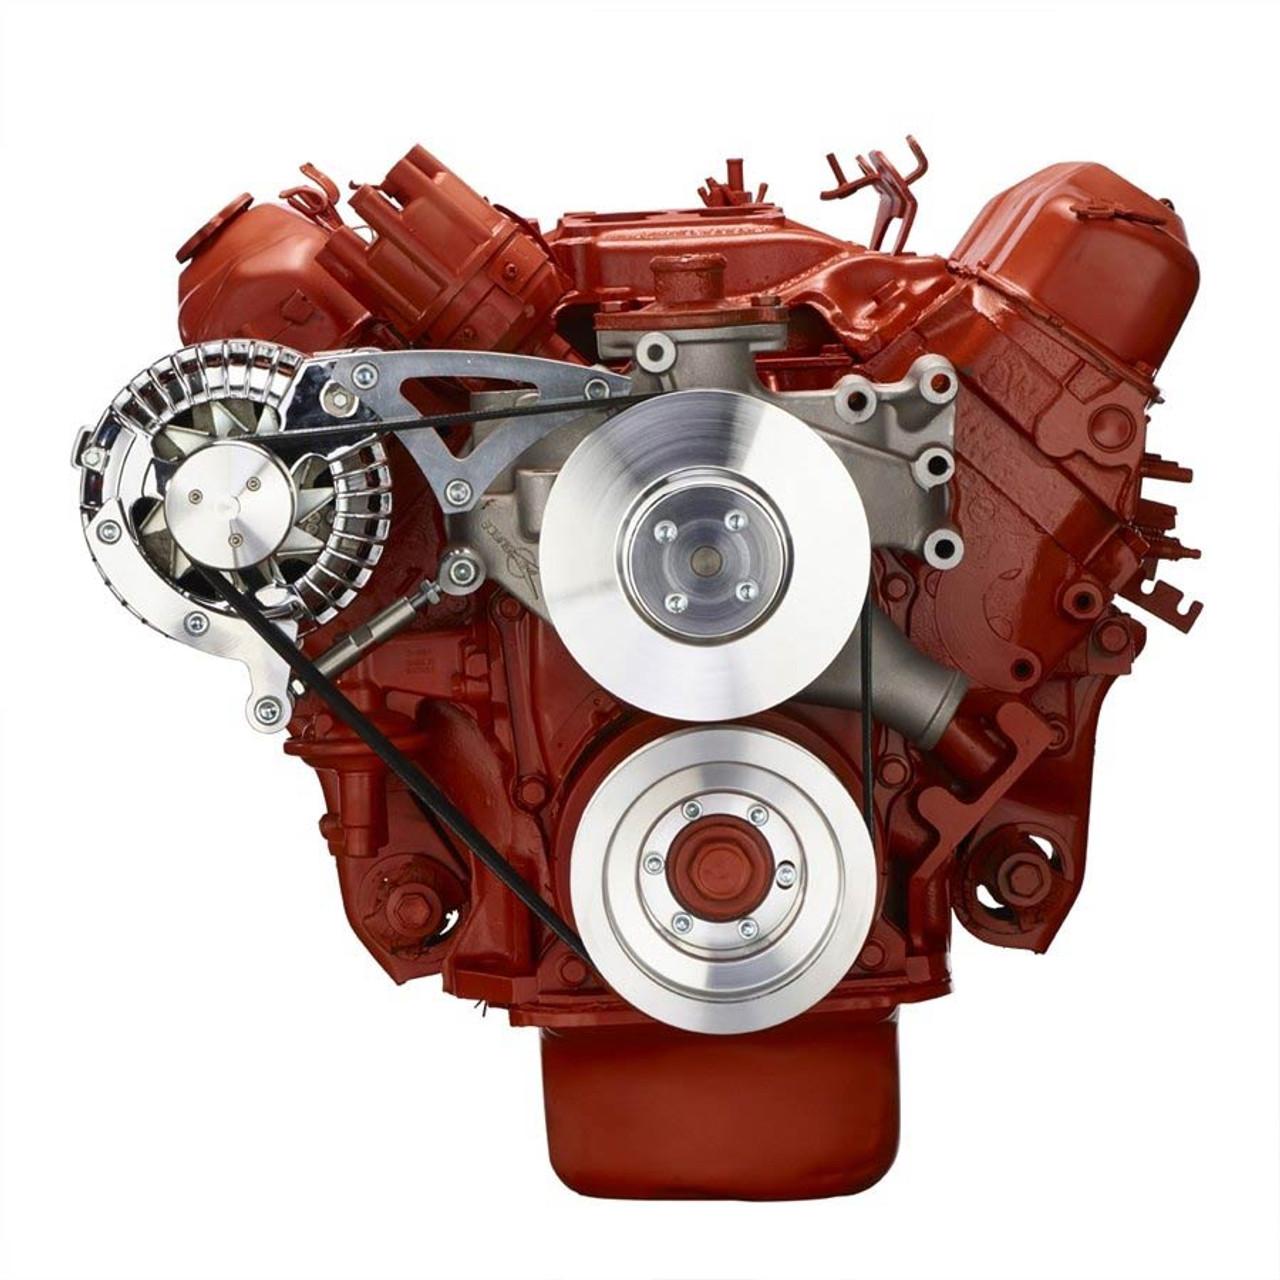 Big Block Chrysler Serpentine Conversion · Big Block Chrysler Serpentine  Conversion ...